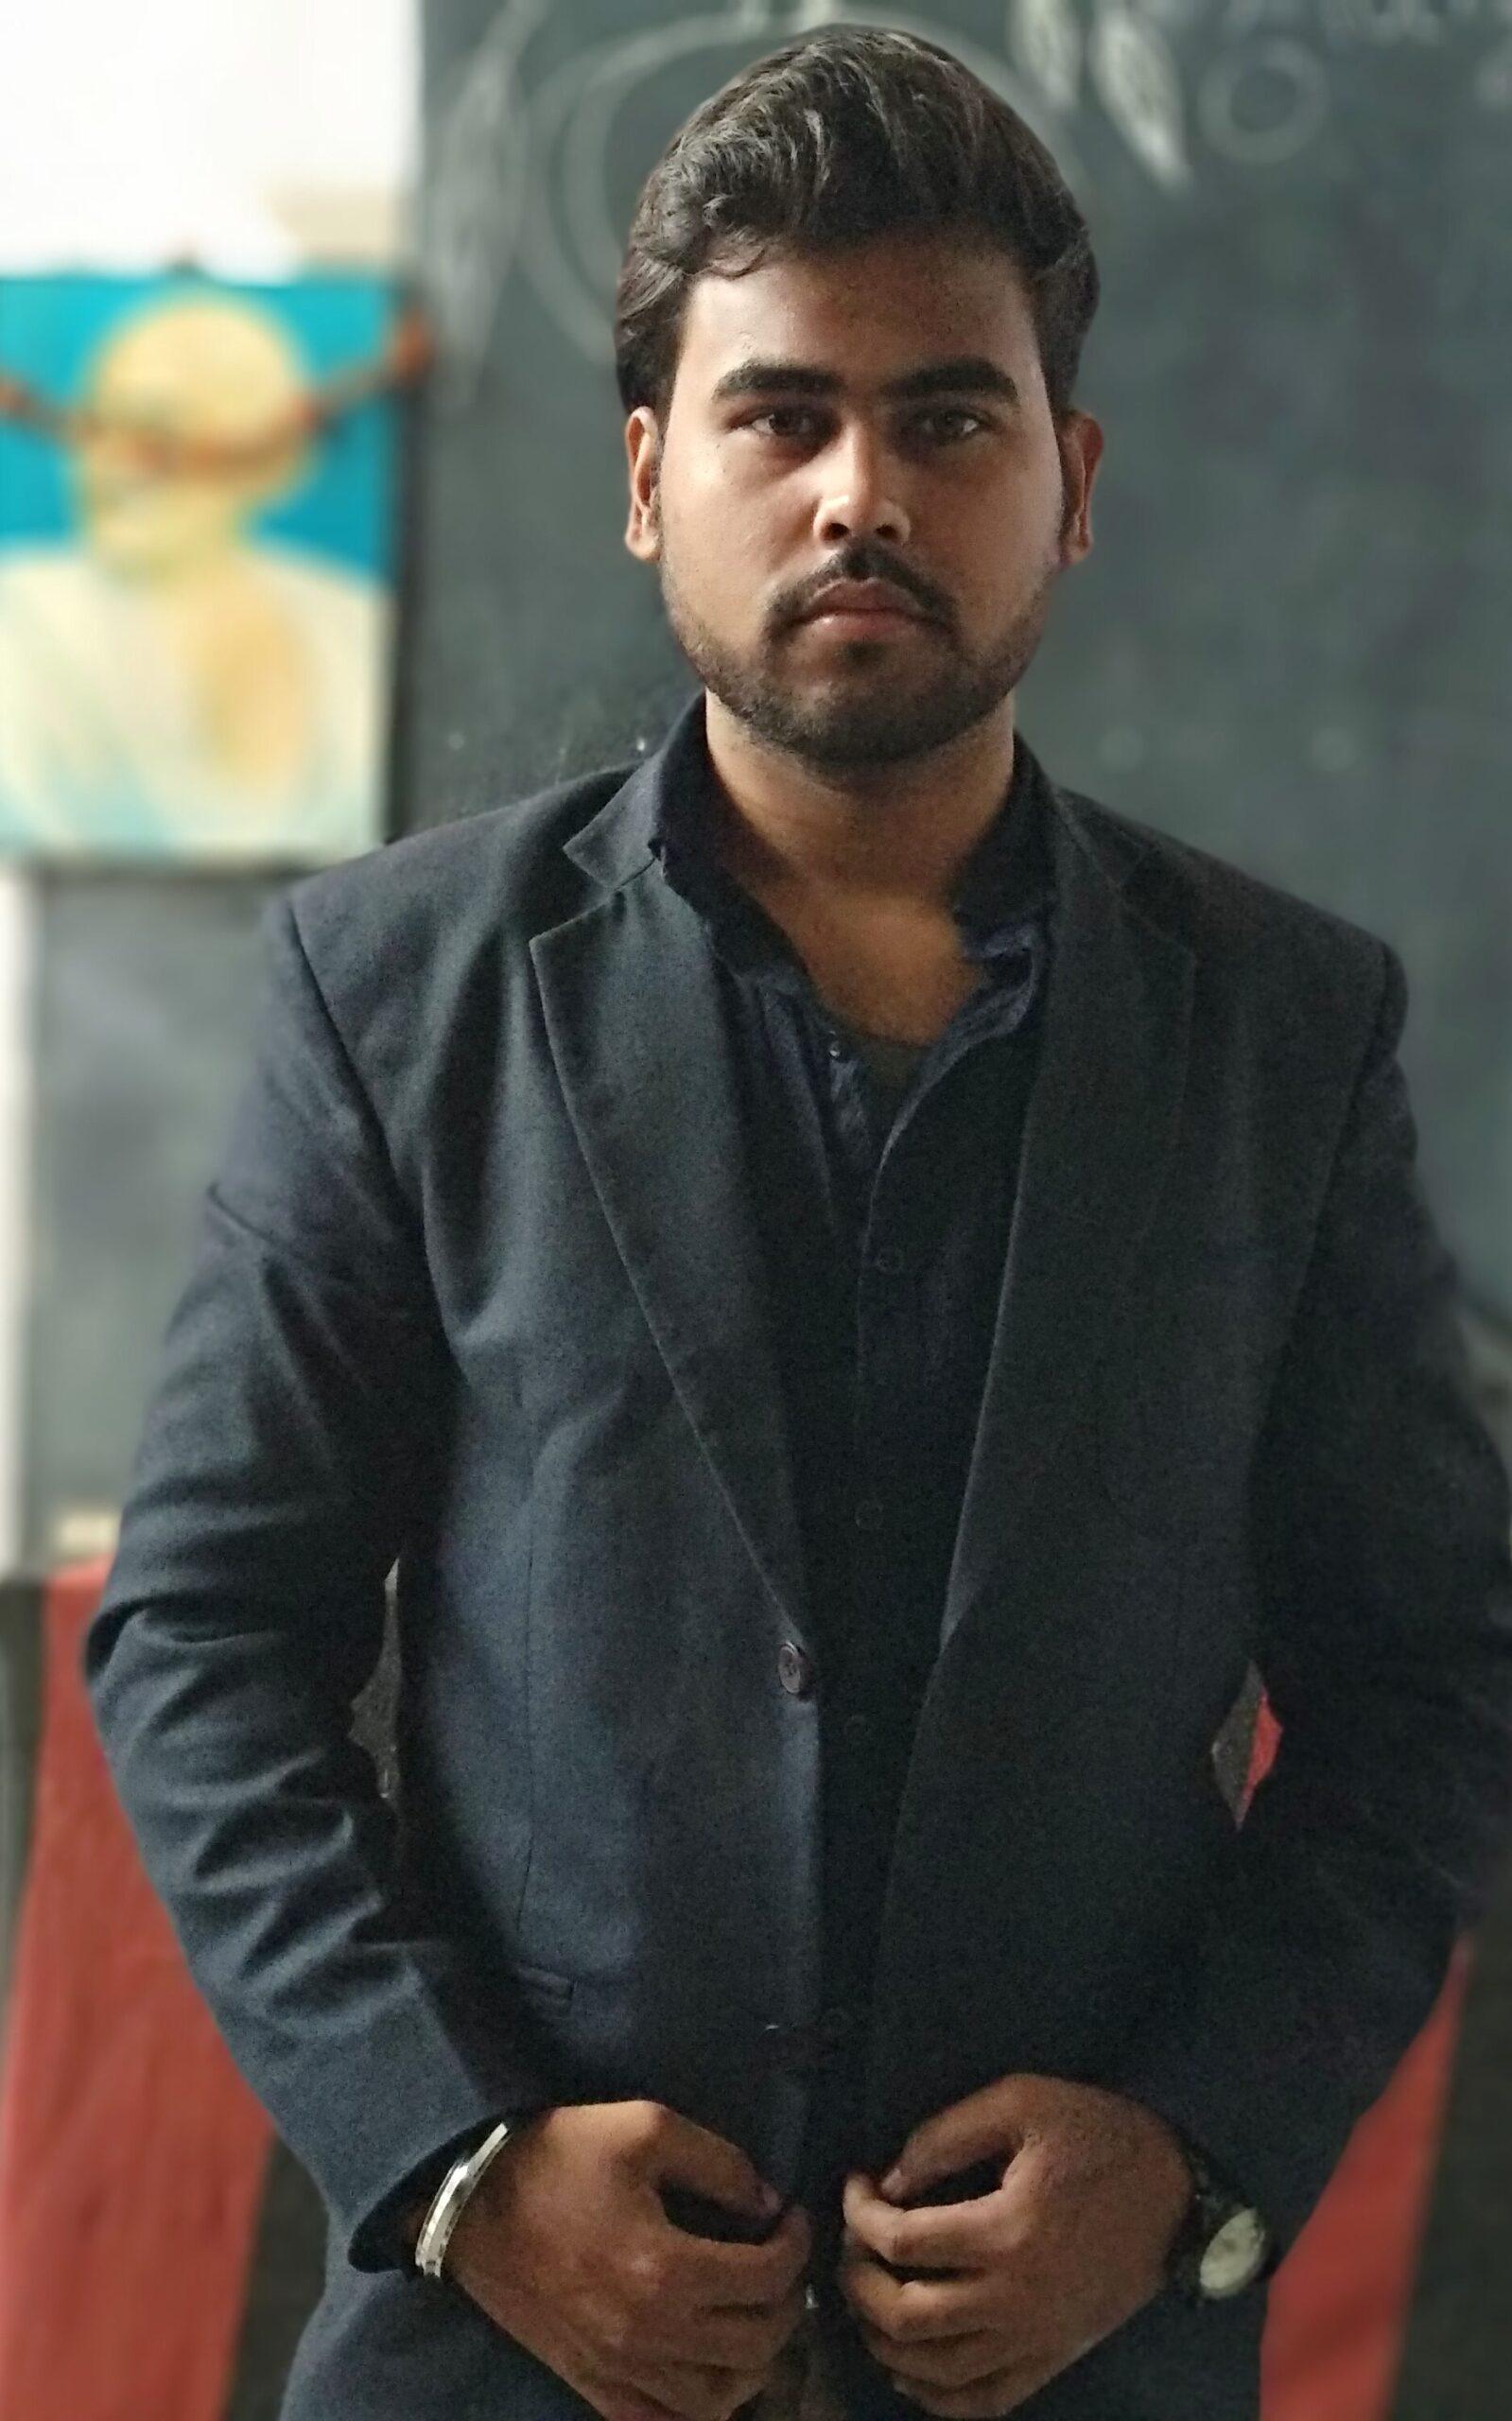 Arvind kumar examshindi owner